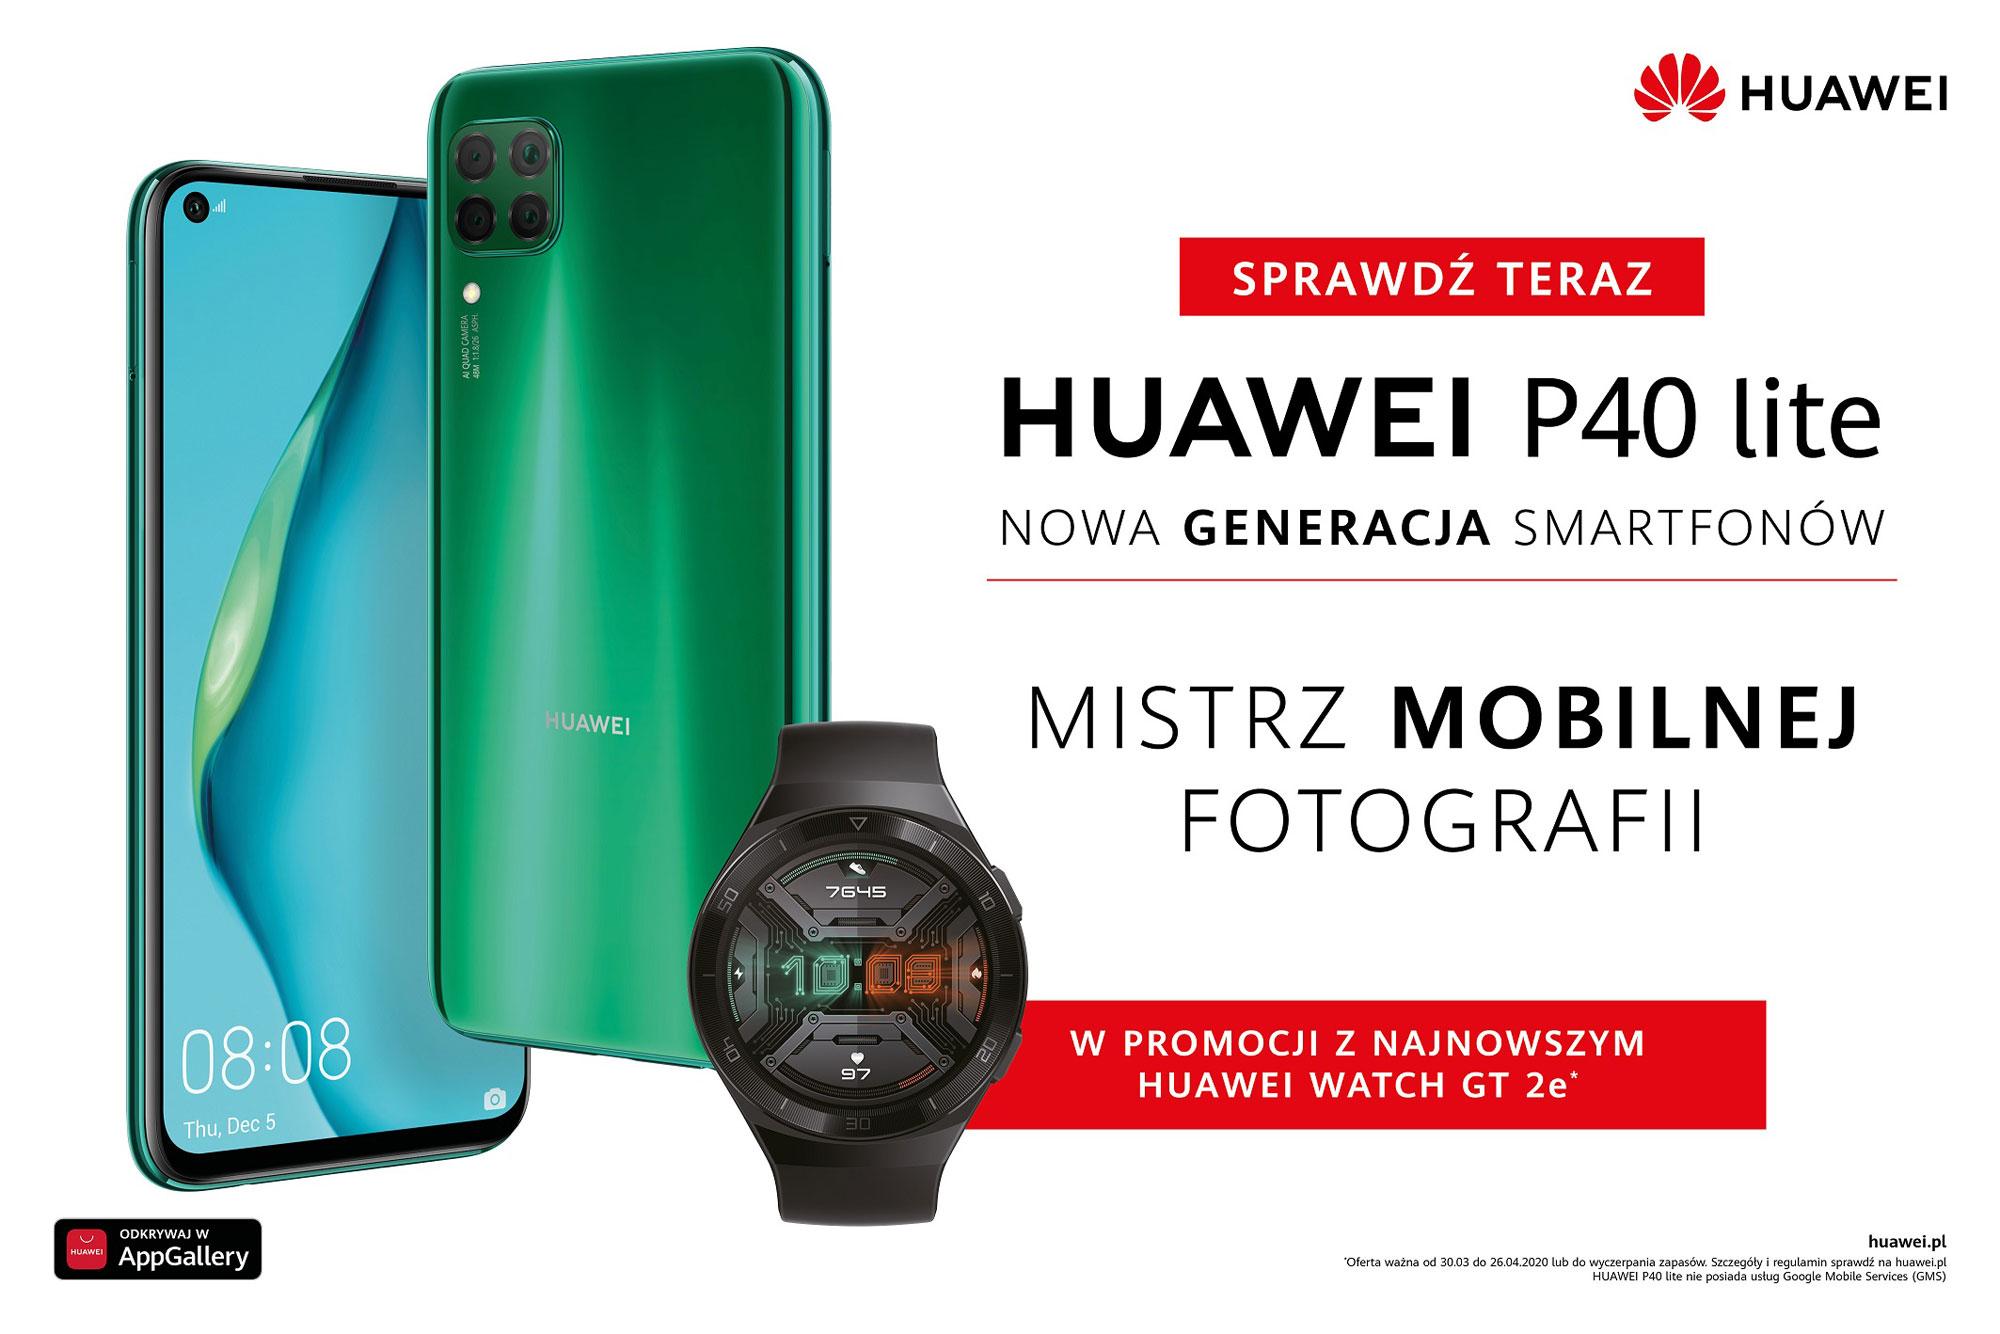 Huawei P40 lite z Watch GT 2e za 1599 zł